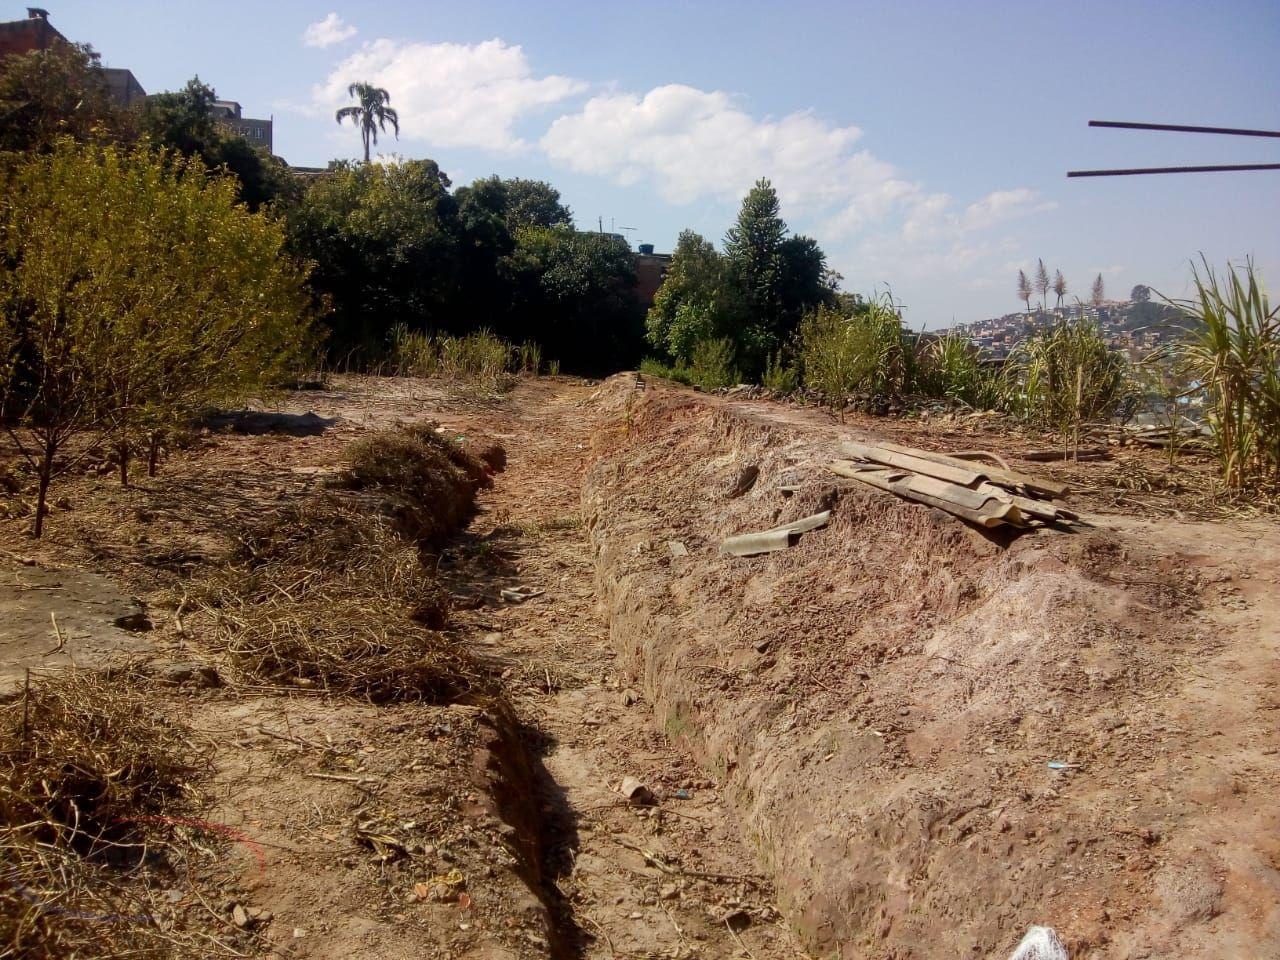 Terreno/Lote à venda  no Vila Bocaina - Mauá, SP. Imóveis